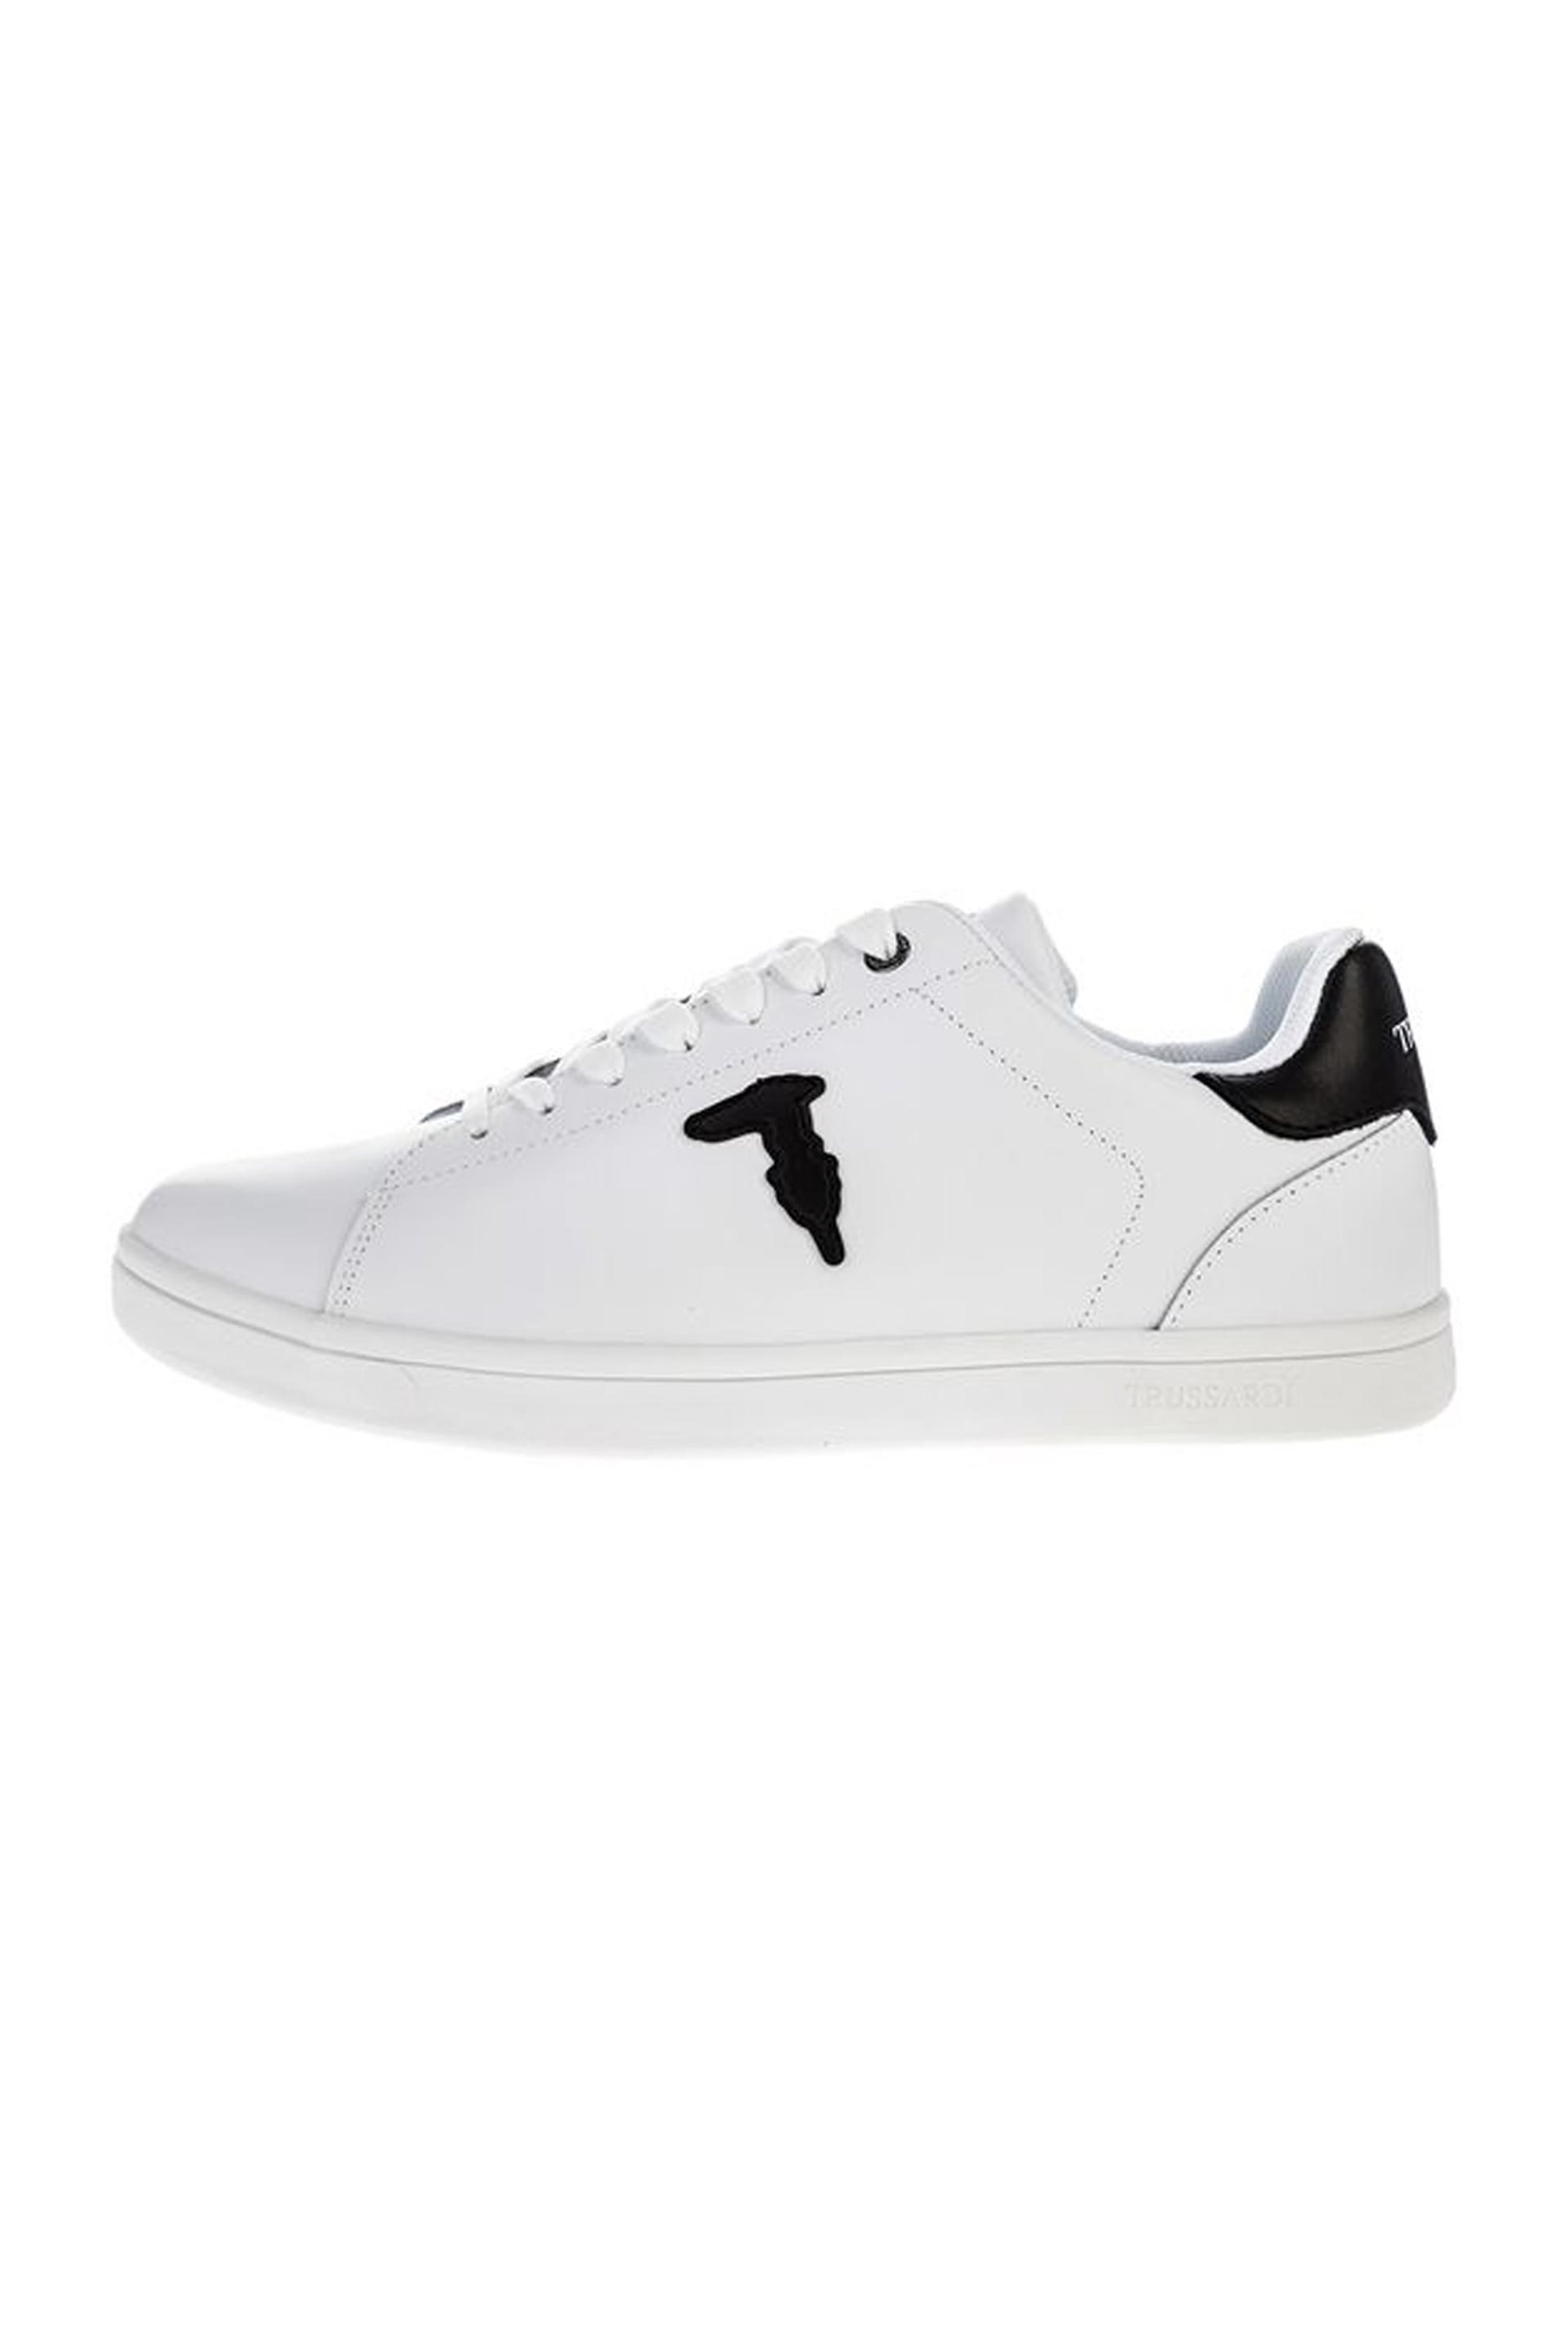 Trussardi ανδρικά sneakers με κορδόνια και logo patch – 77A00241-9Y099999 – Μαύρο Noir